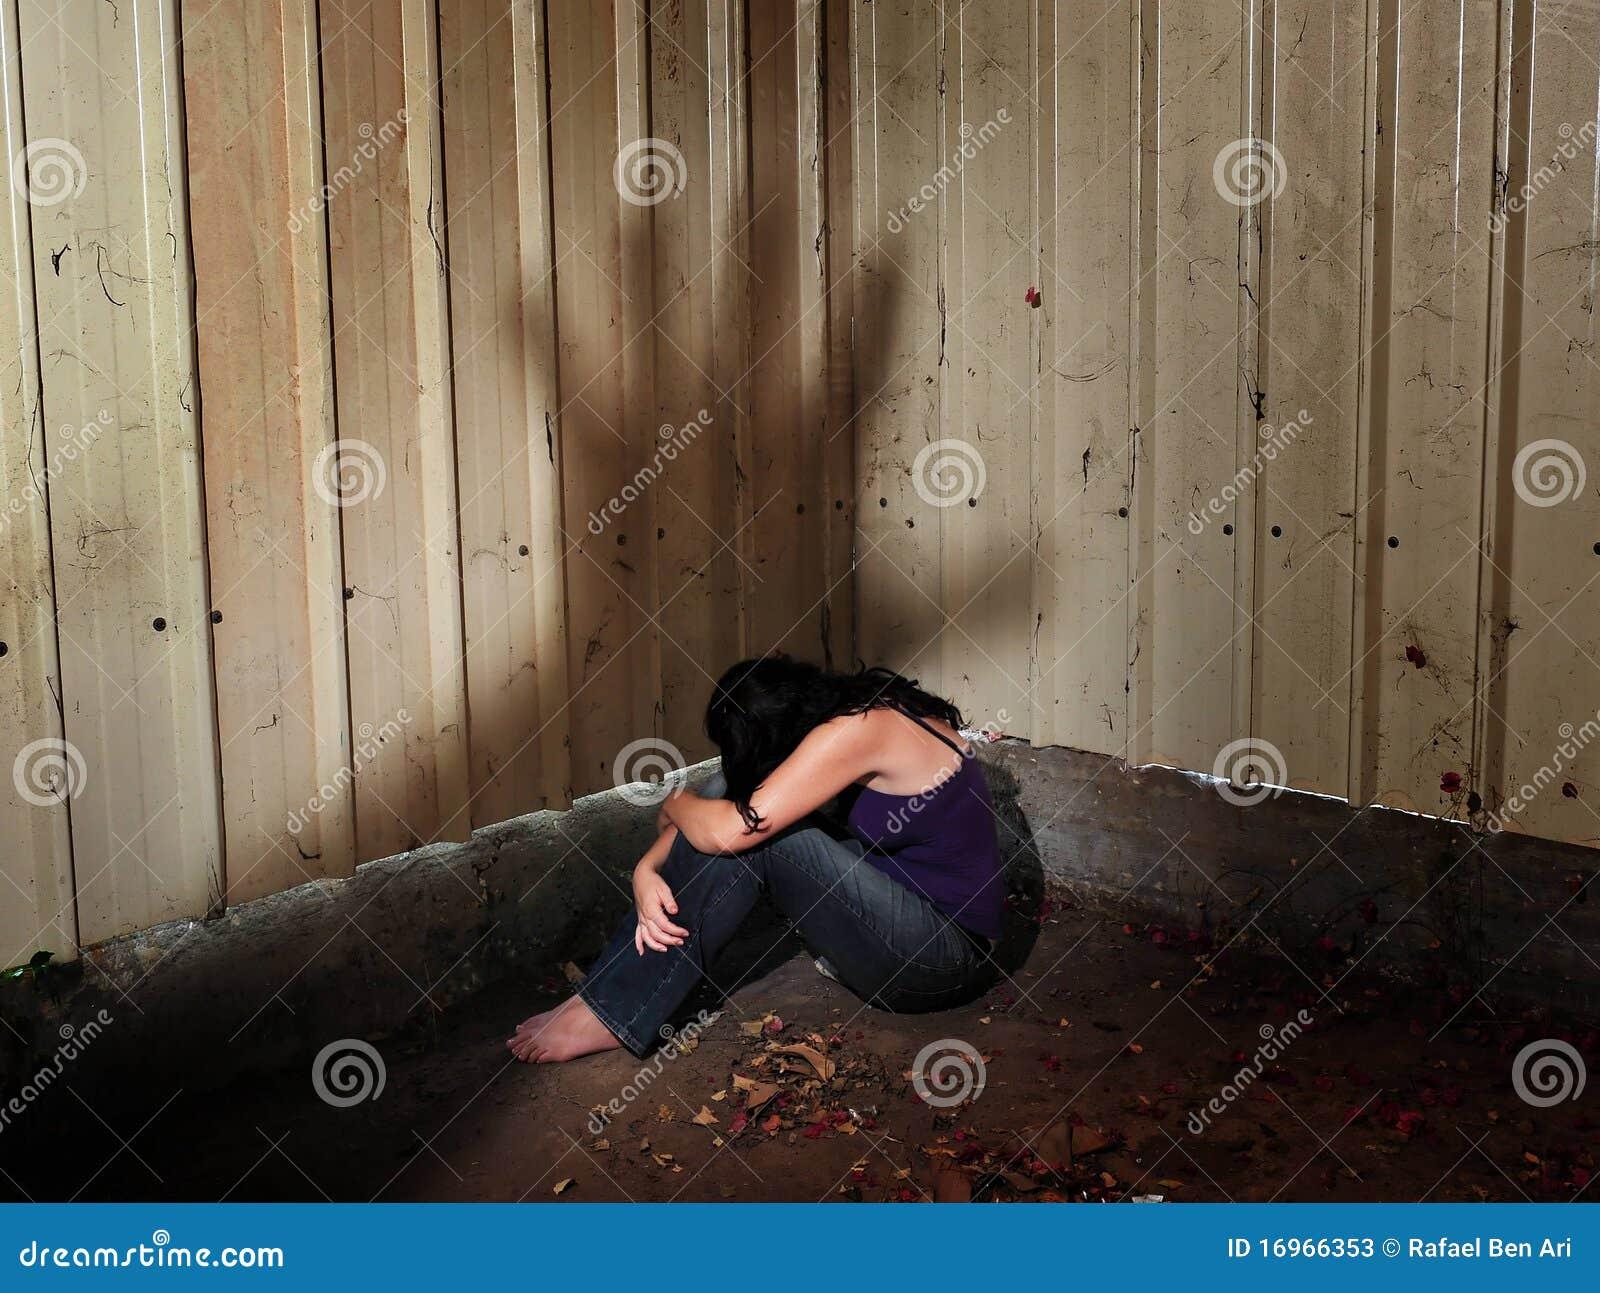 Abused Victim Stock Image Image Of Shadow Life Female